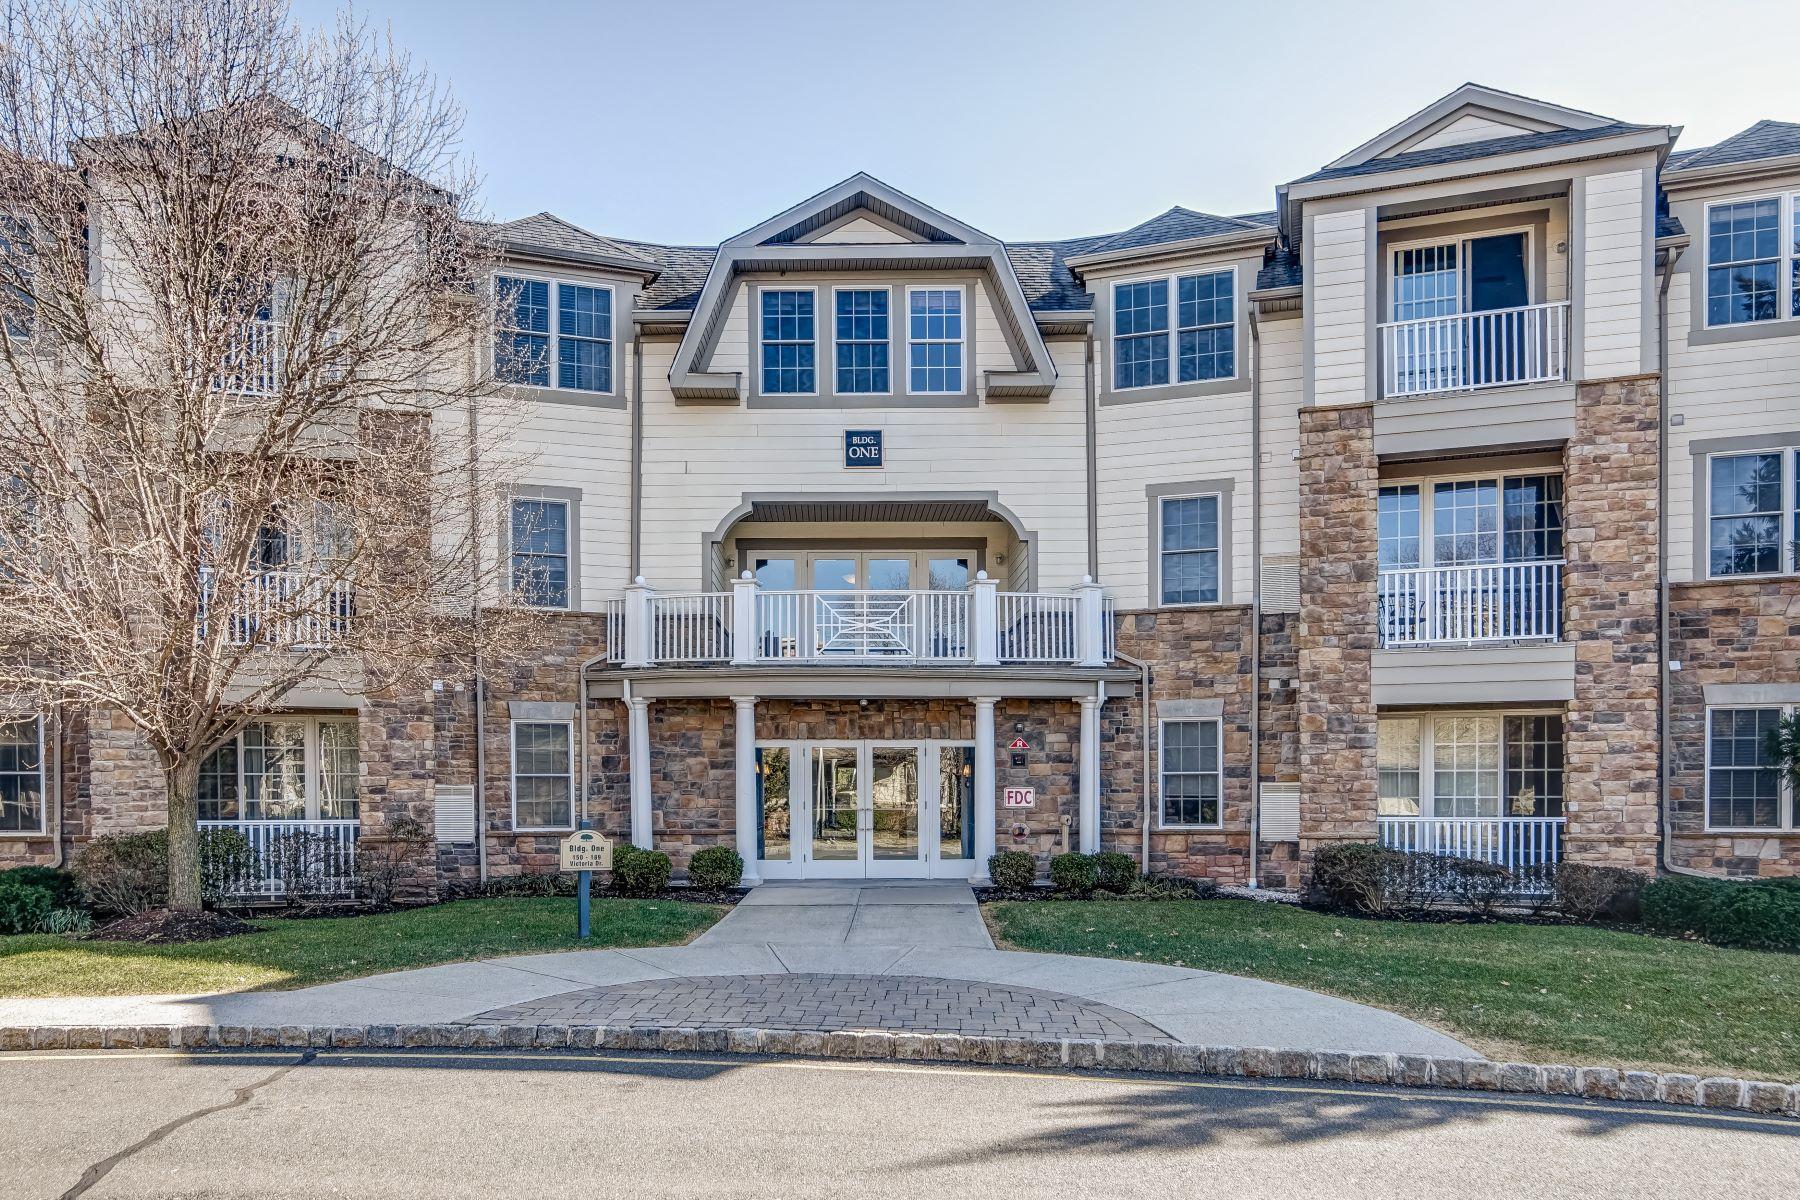 Condominium for Sale at Exceptional Condo Living 181 Victoria Drive, Bridgewater, New Jersey, 08807 United States